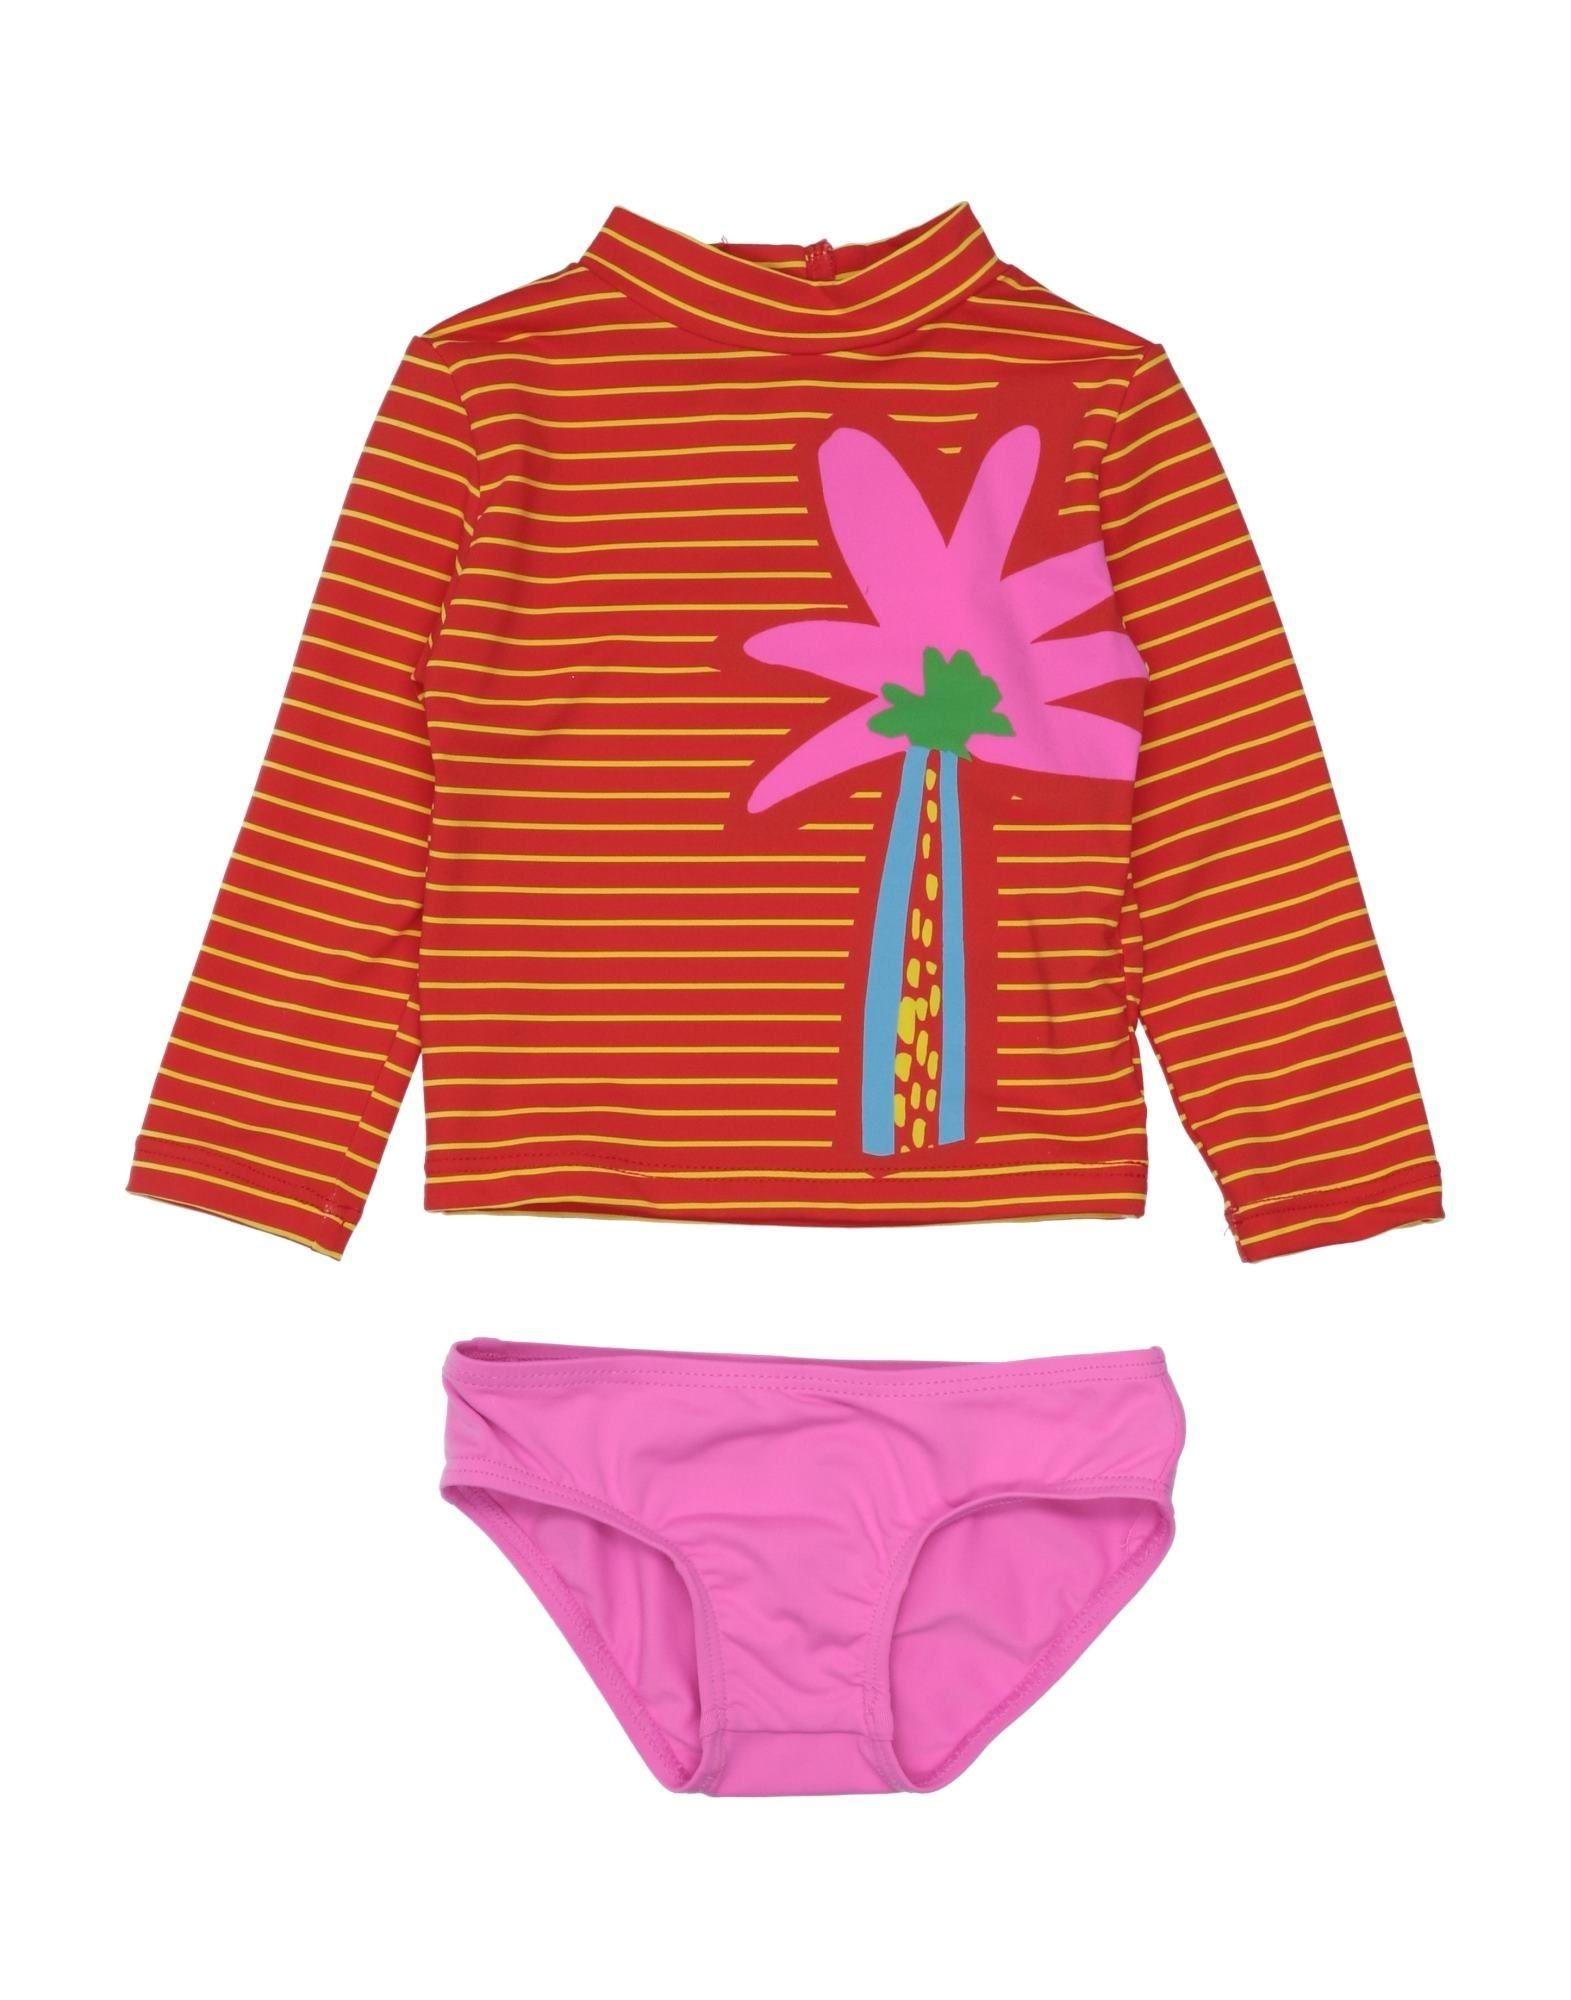 Stella mccartney girls swimming costume